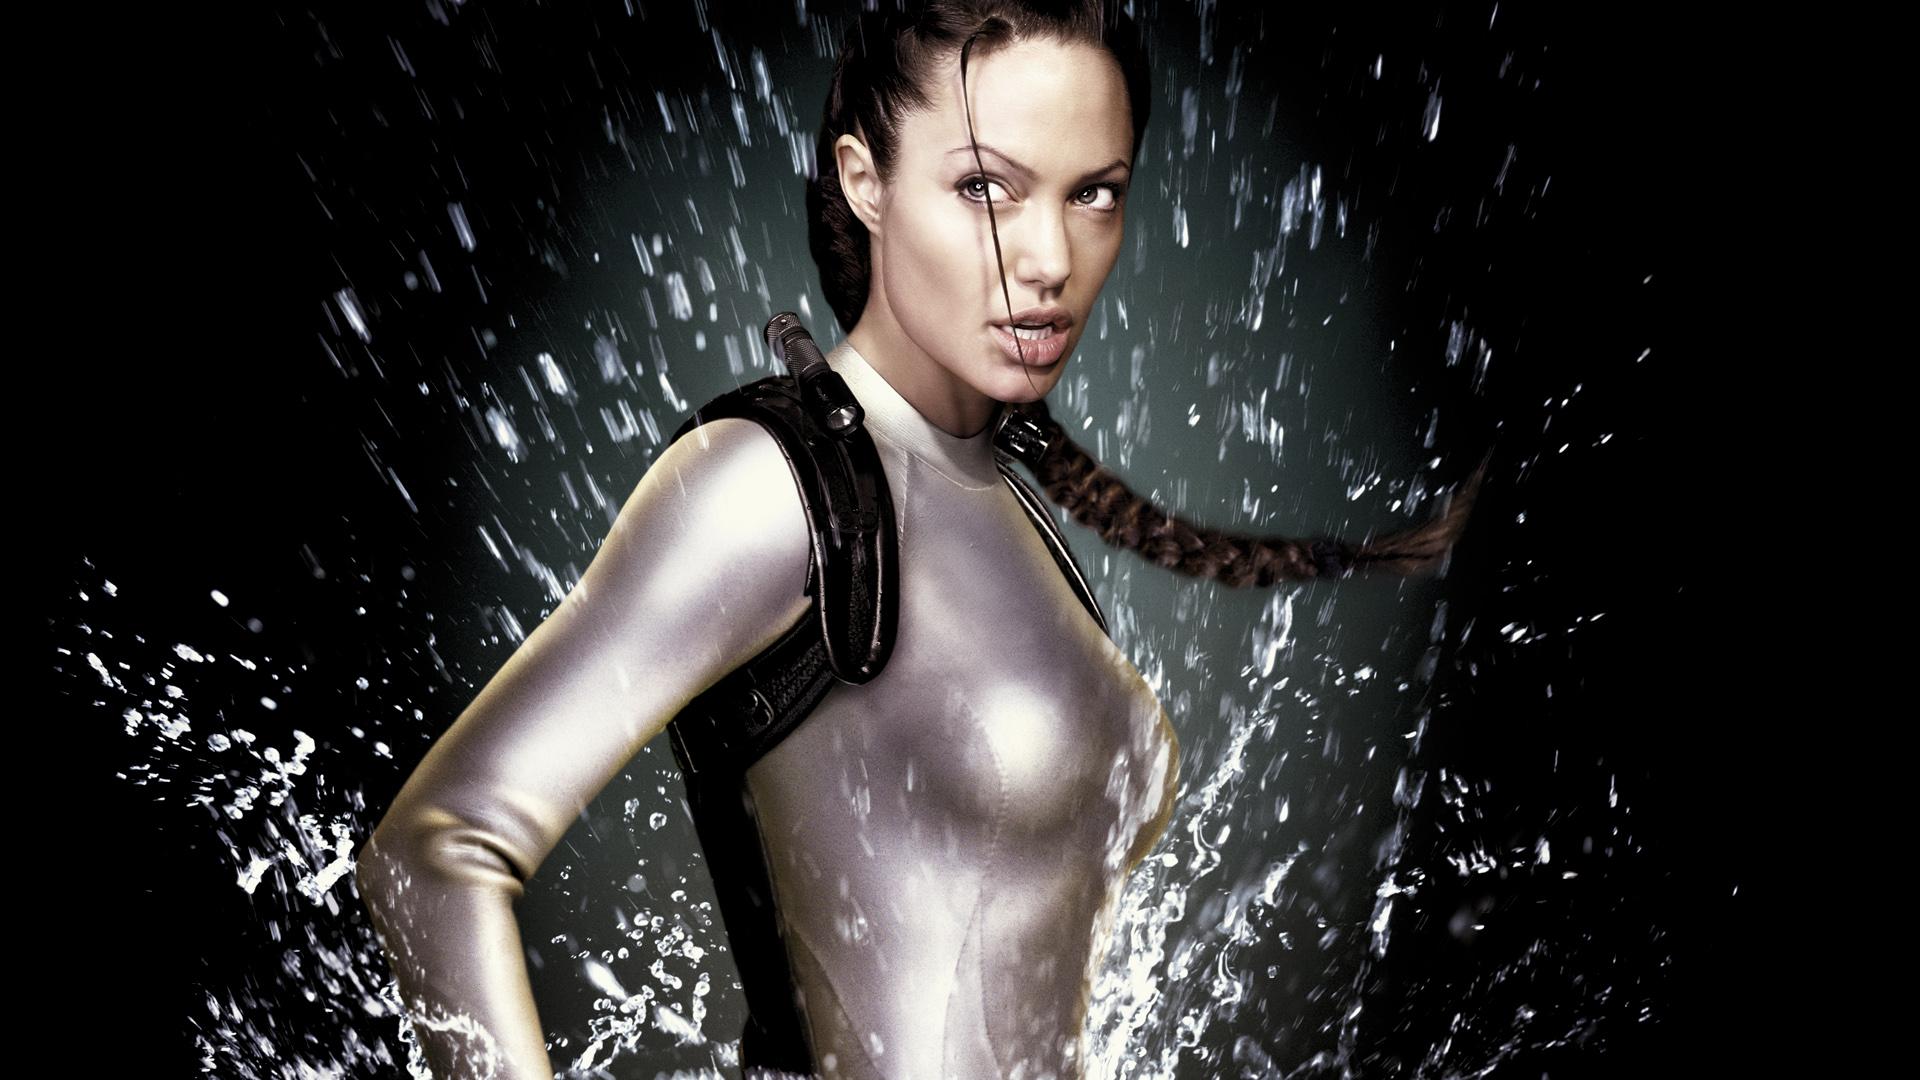 Tomb raider soft porn film pron scene